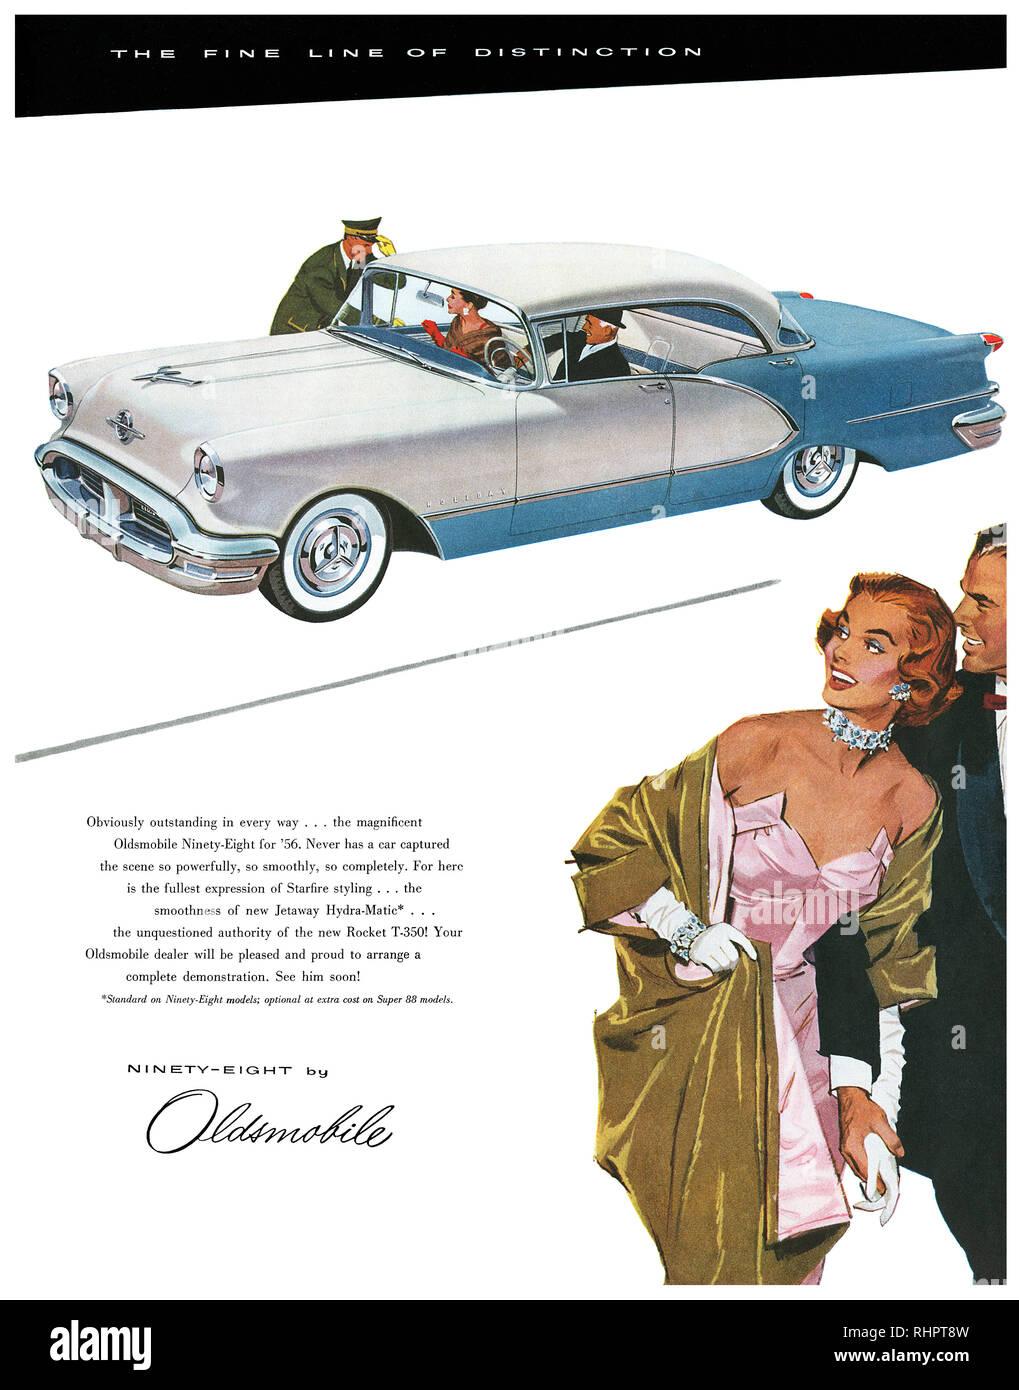 1956 U.S. advertisement for the Oldsmobile Ninety-Eight automobile. - Stock Image